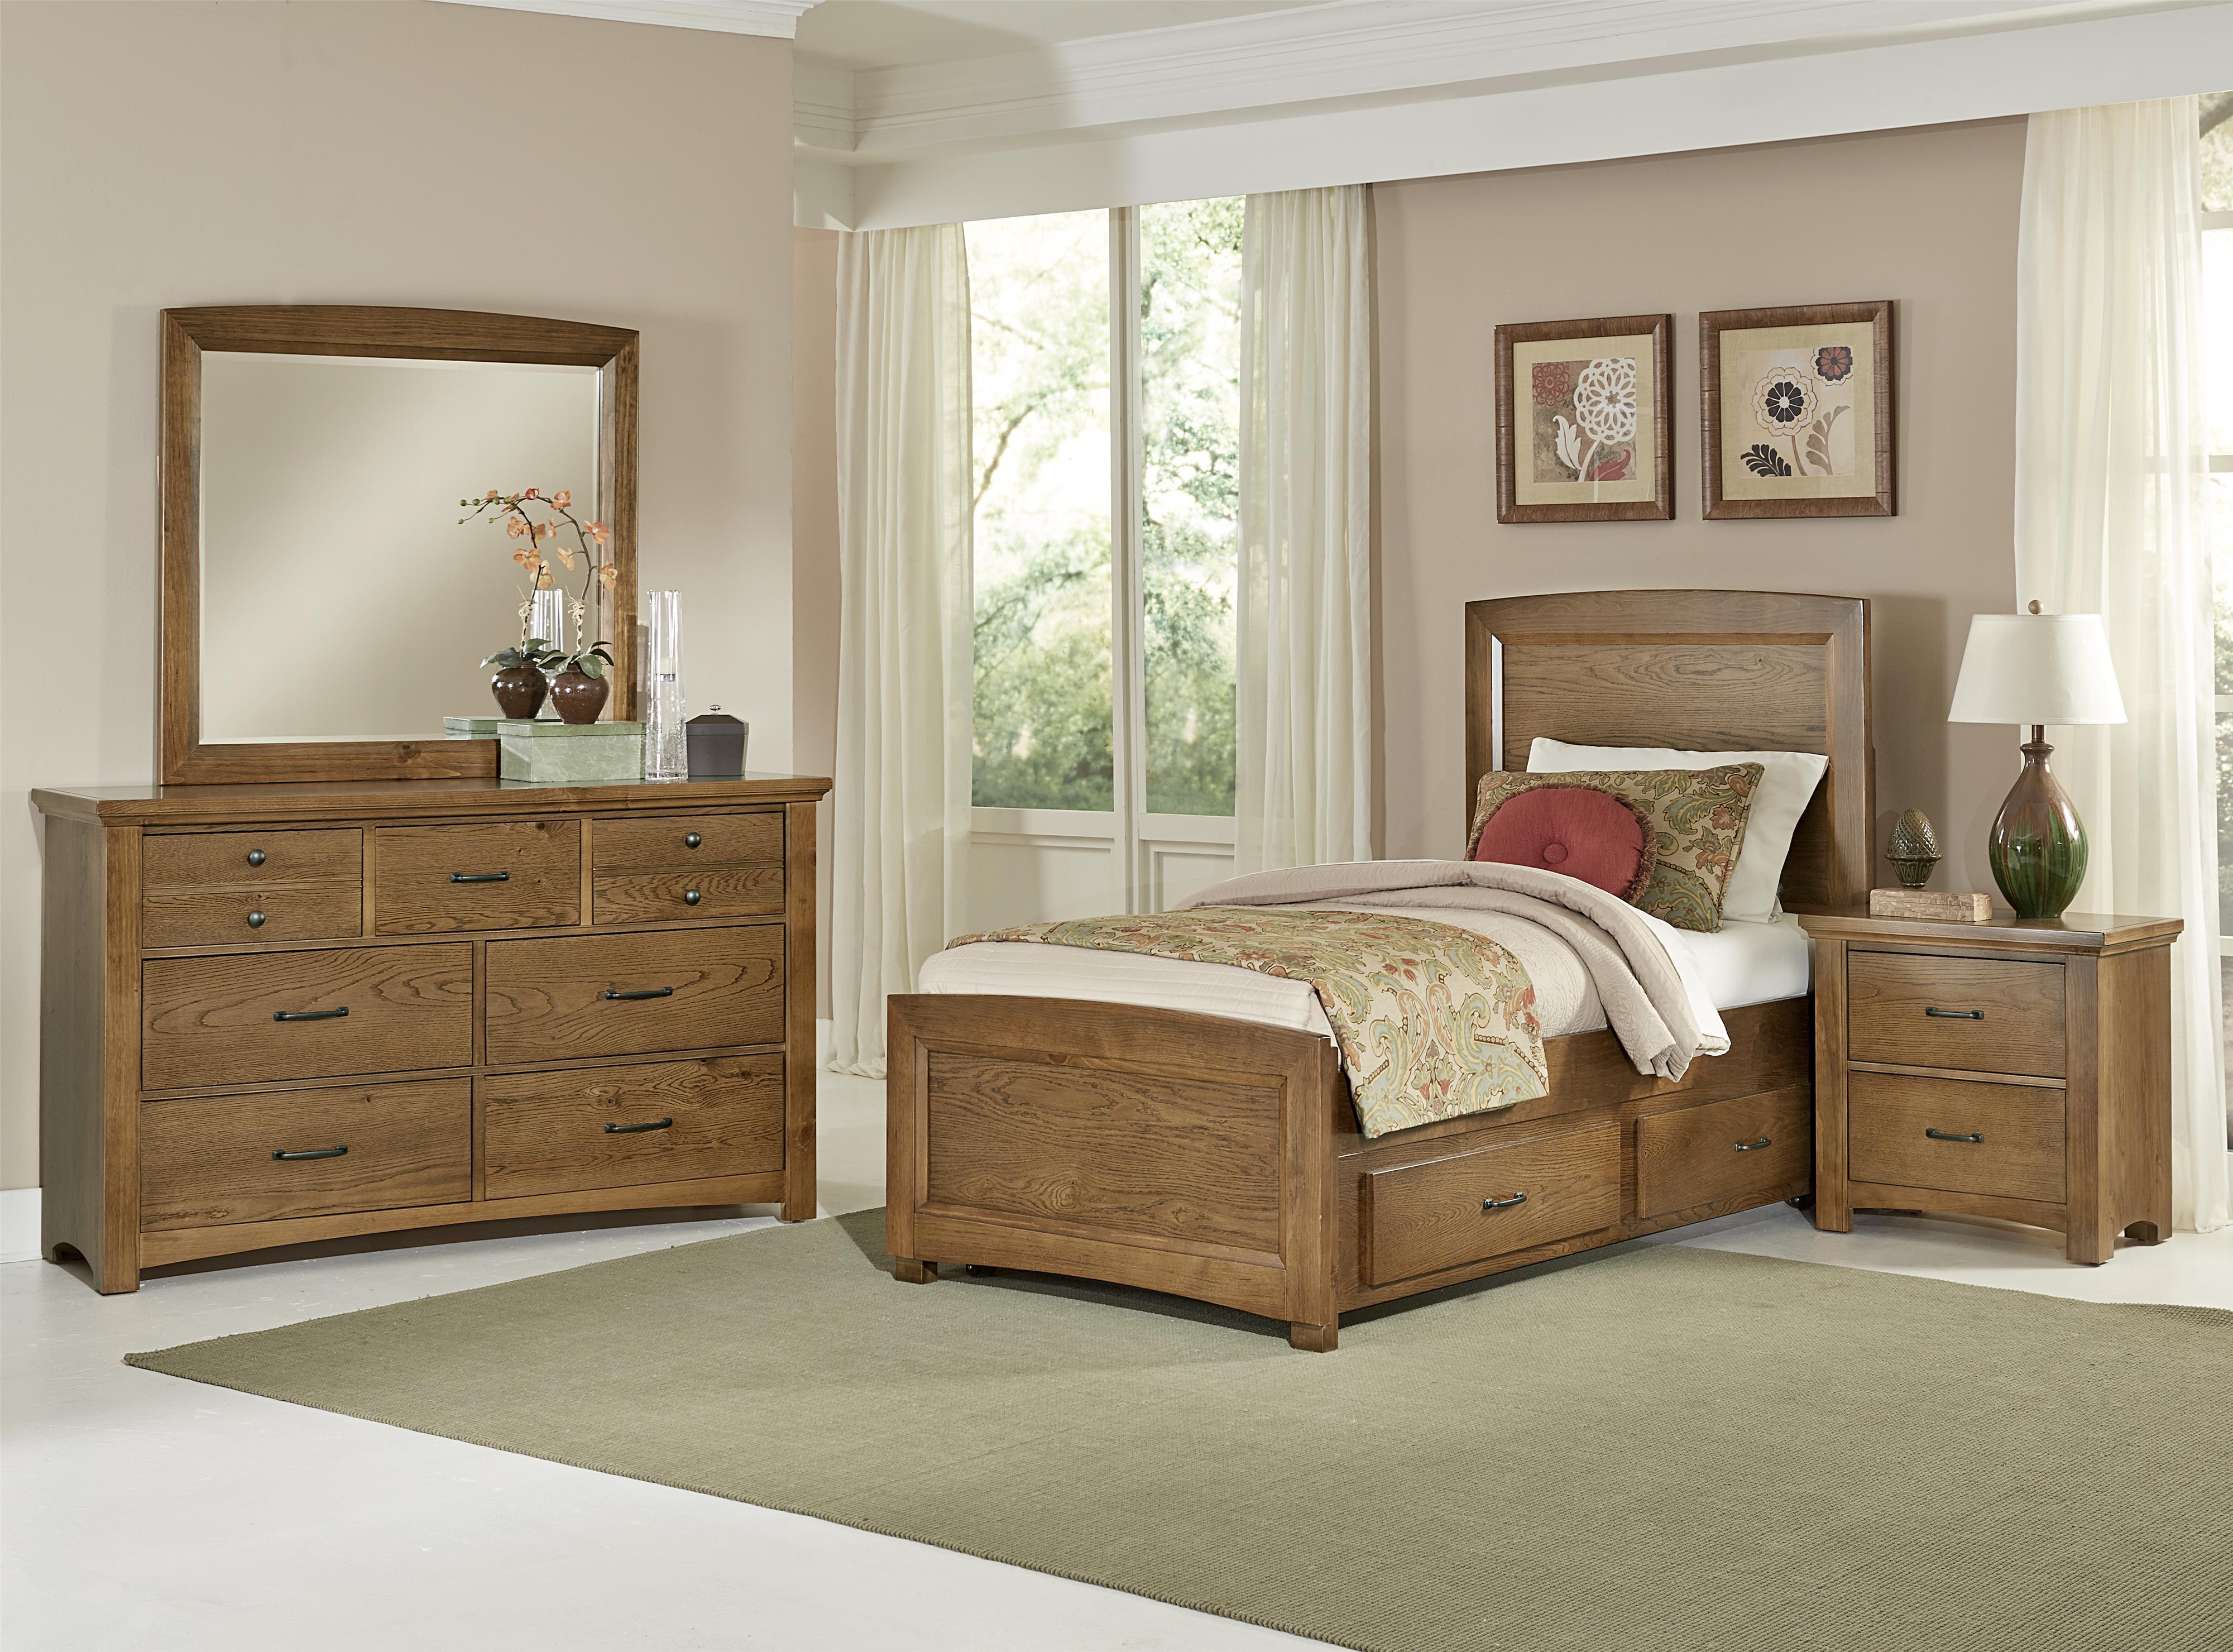 vaughan bassett transitions twin bedroom group belfort furniture bedroom groups. Black Bedroom Furniture Sets. Home Design Ideas